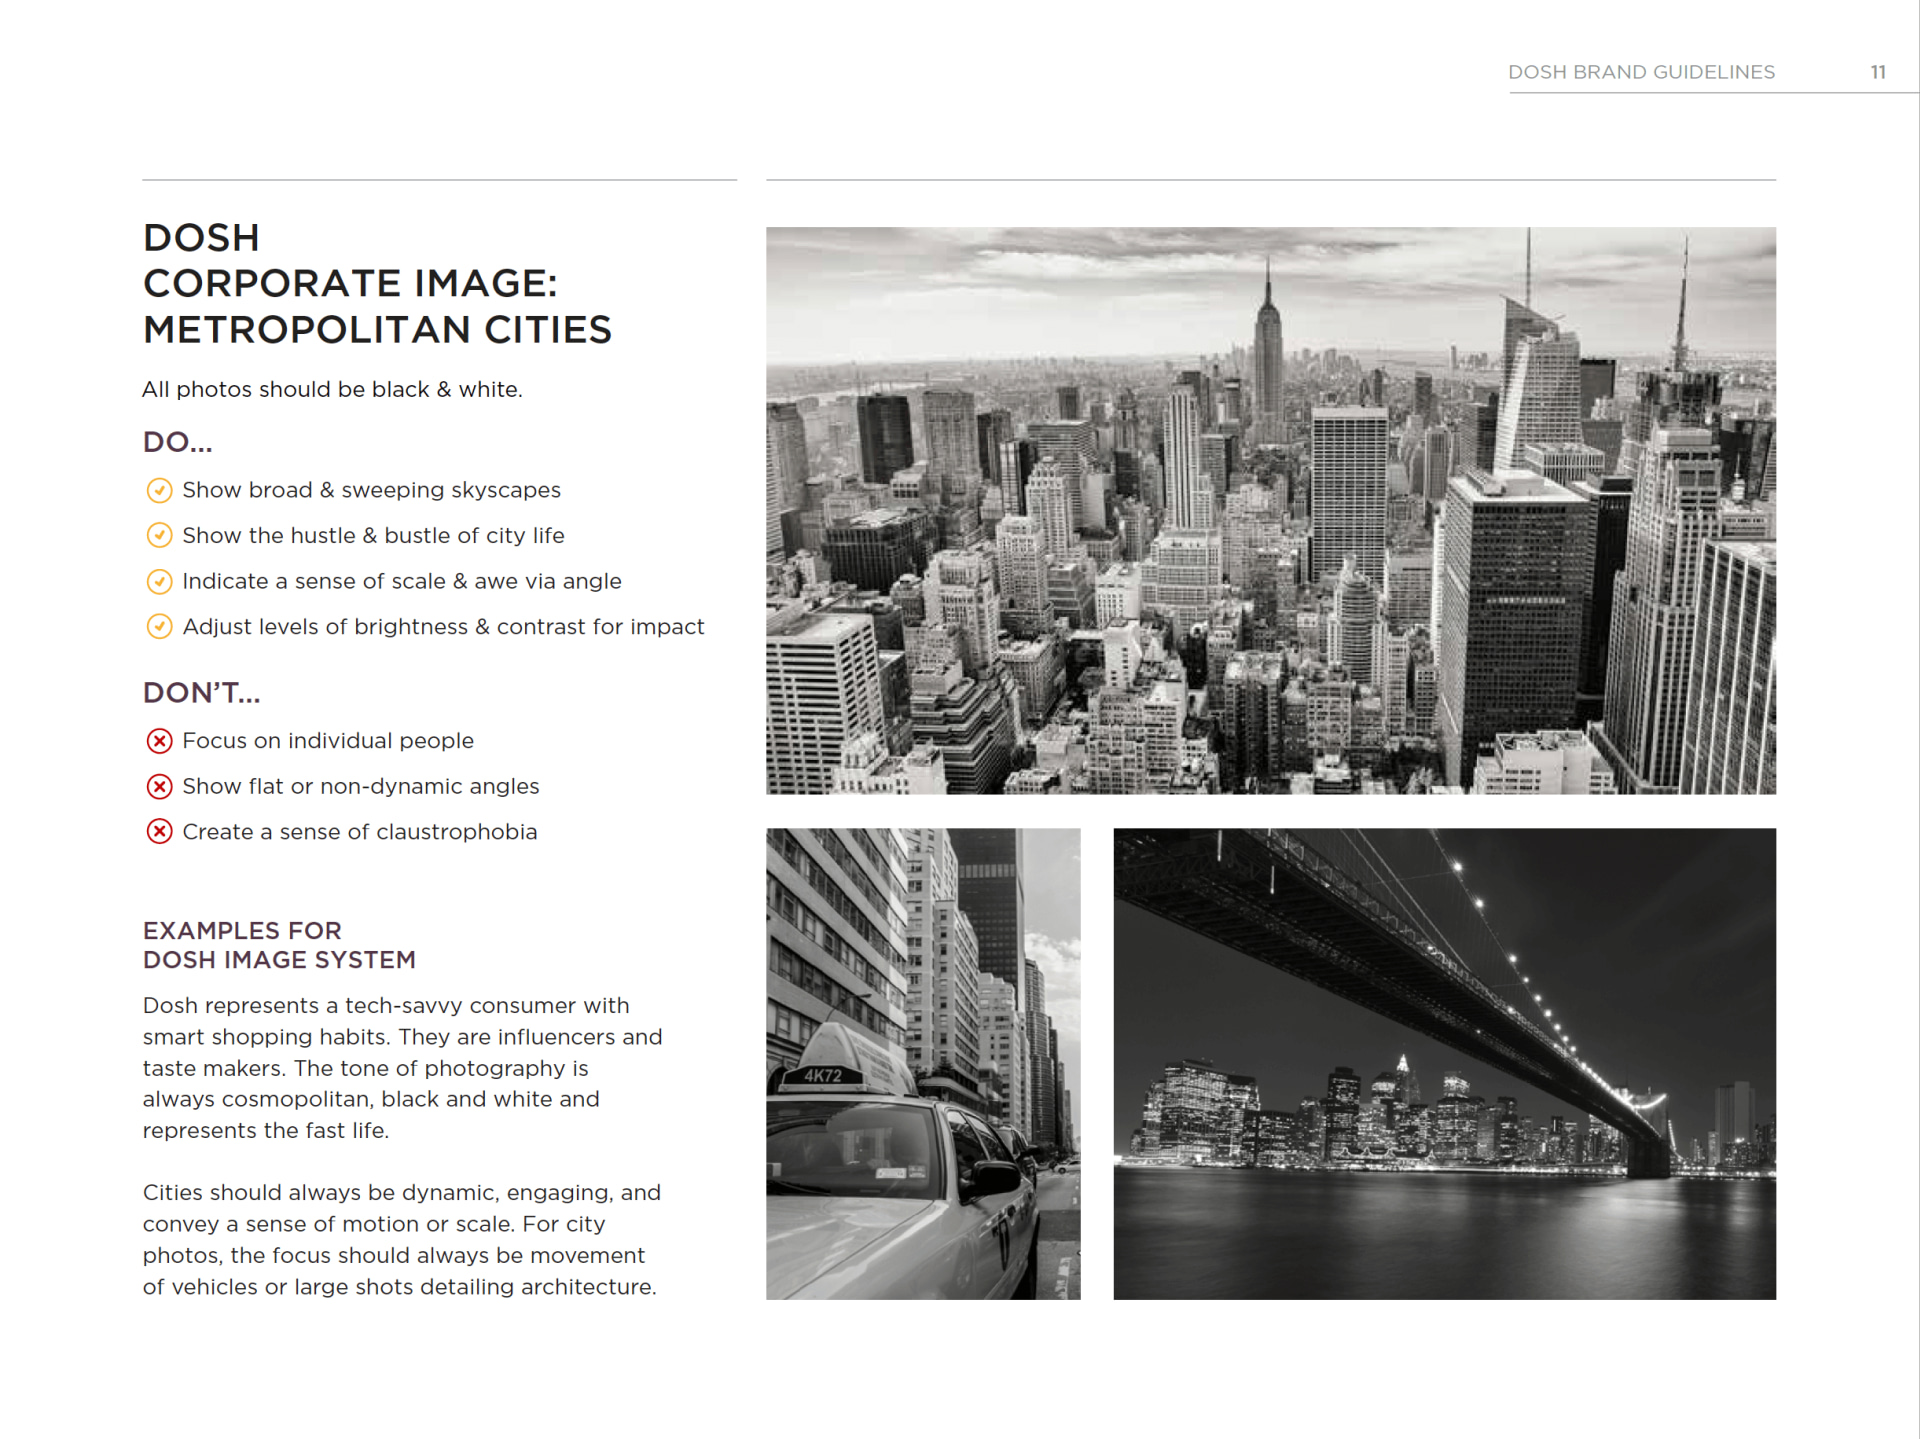 DOSH Black & white photography of city skylines Rocksauce Studios